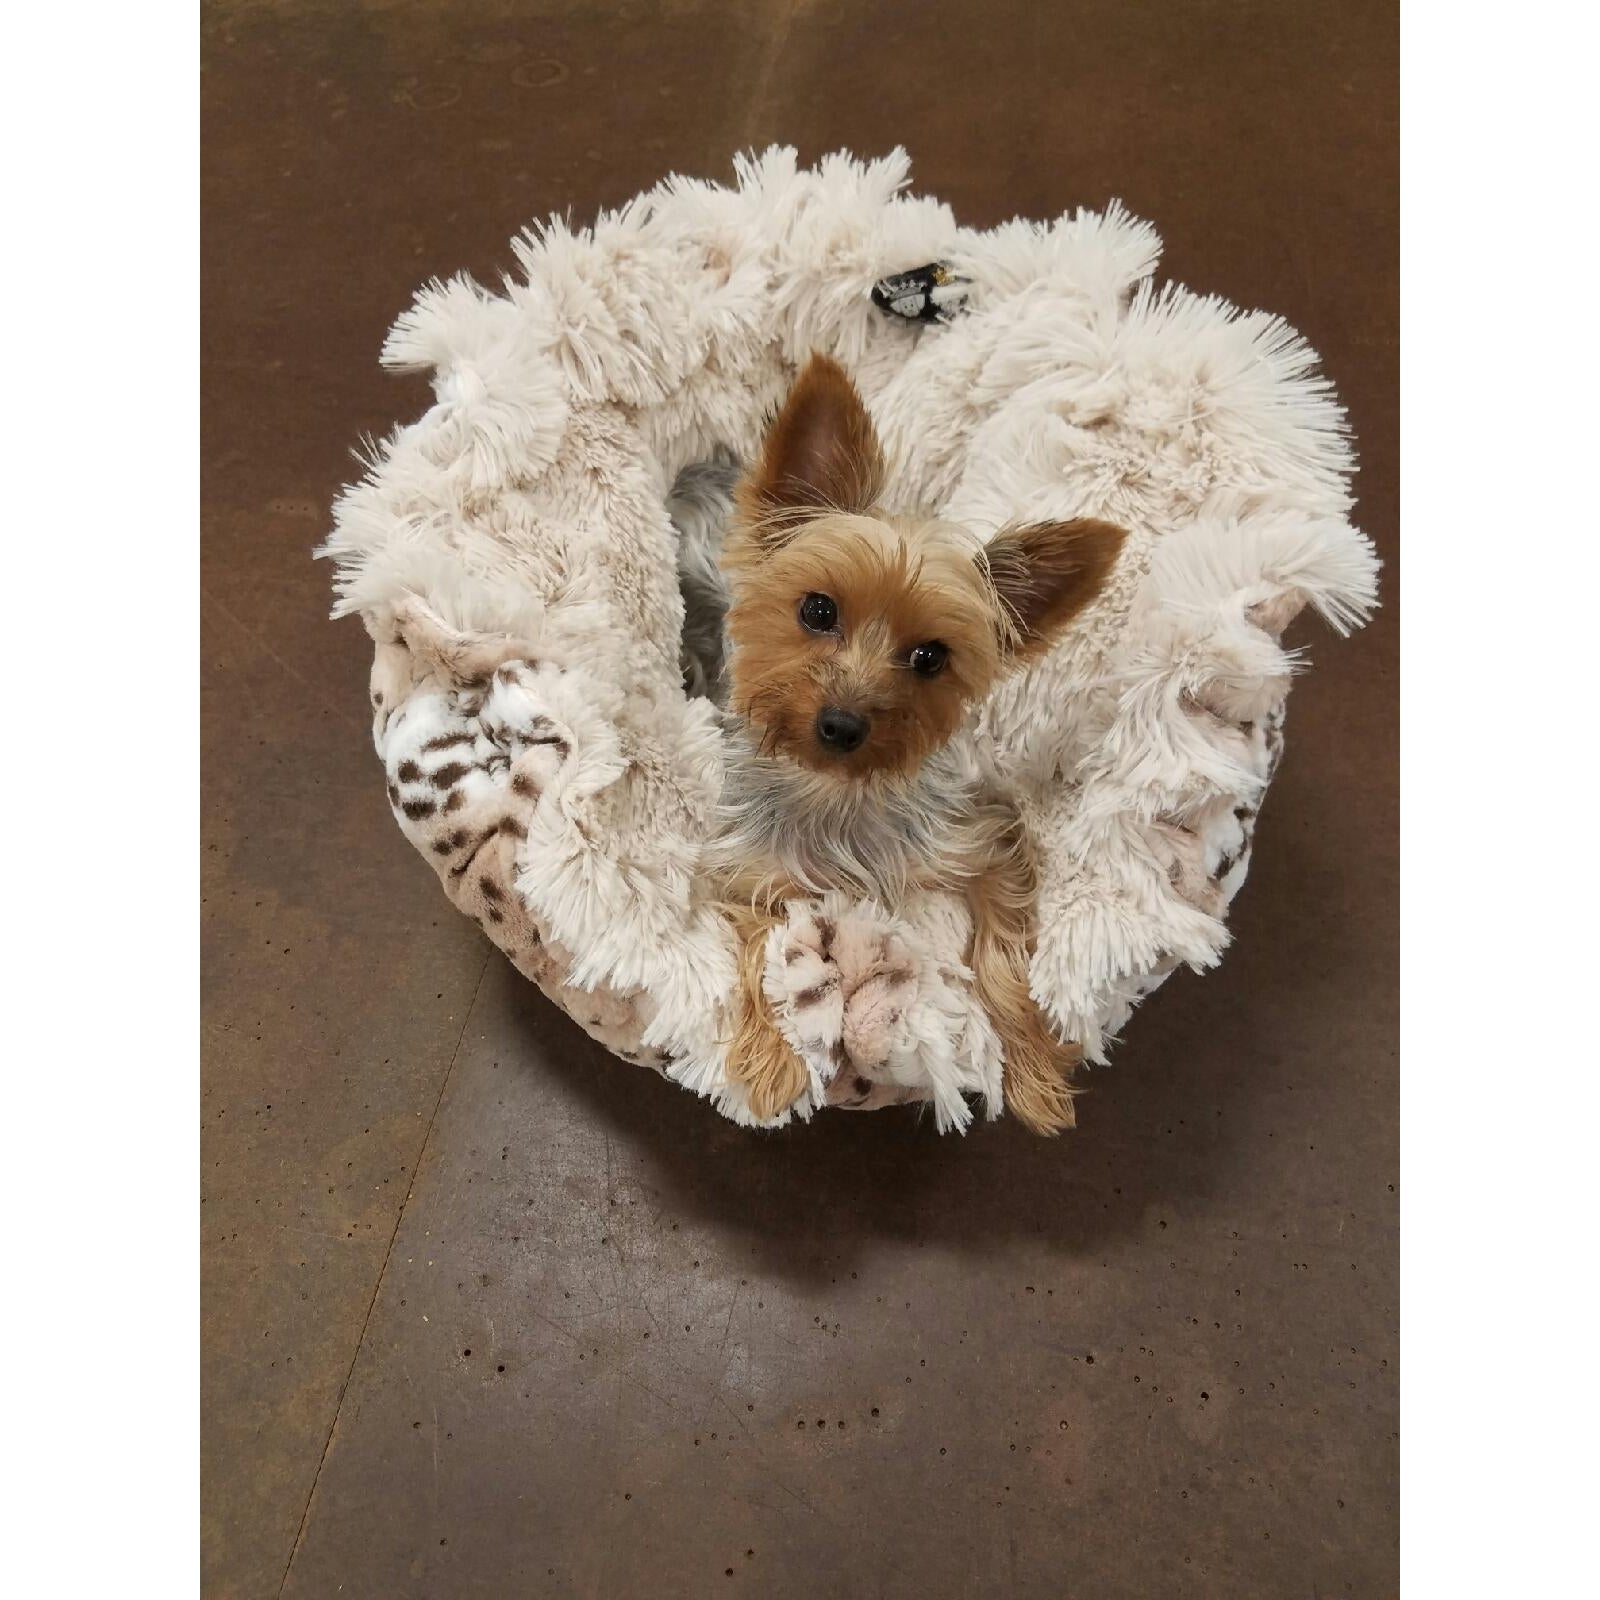 Blondie, Aspen Snow Leopard Pet Bed-in-a-Blanket (Snow Le...